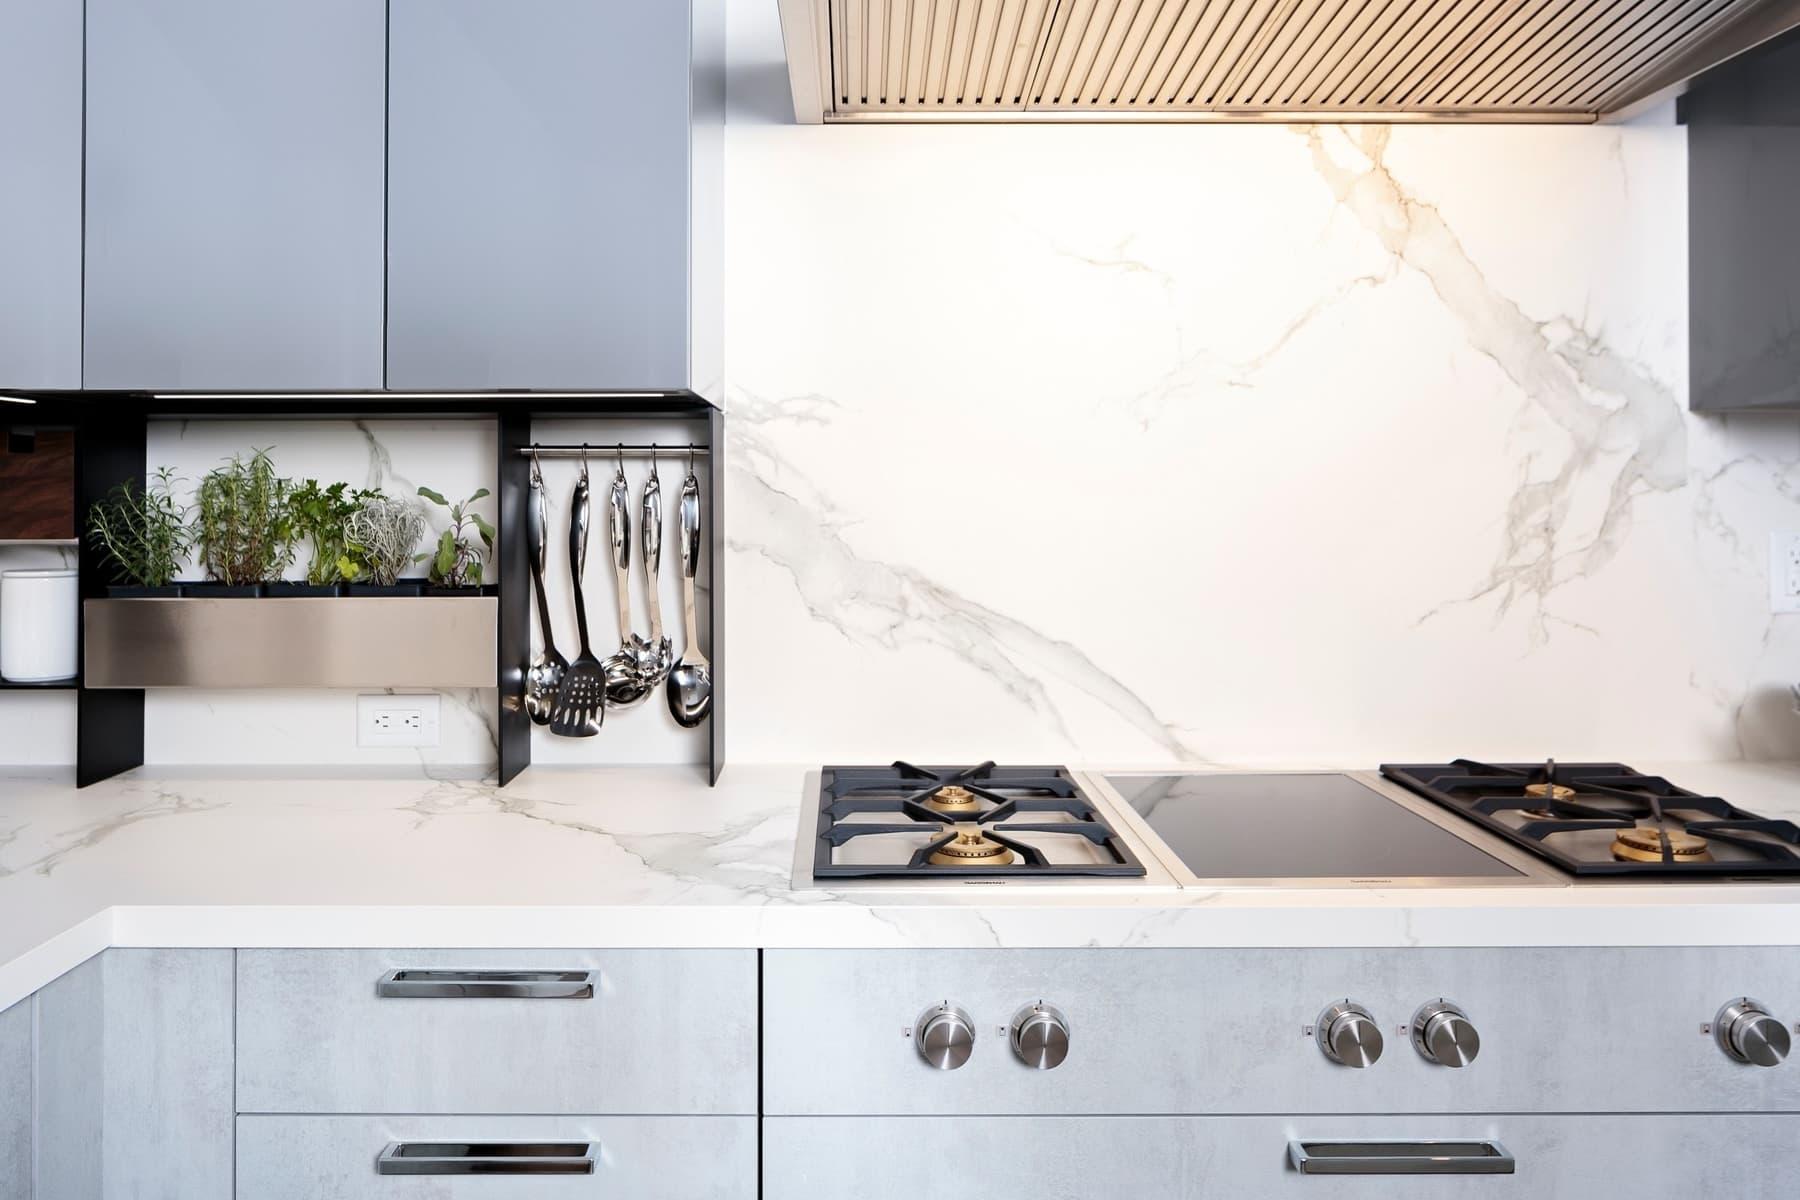 gaggenau stove and eggersmann's 15 square backsplash of the model unit of arabella luxury high rise condos in houston